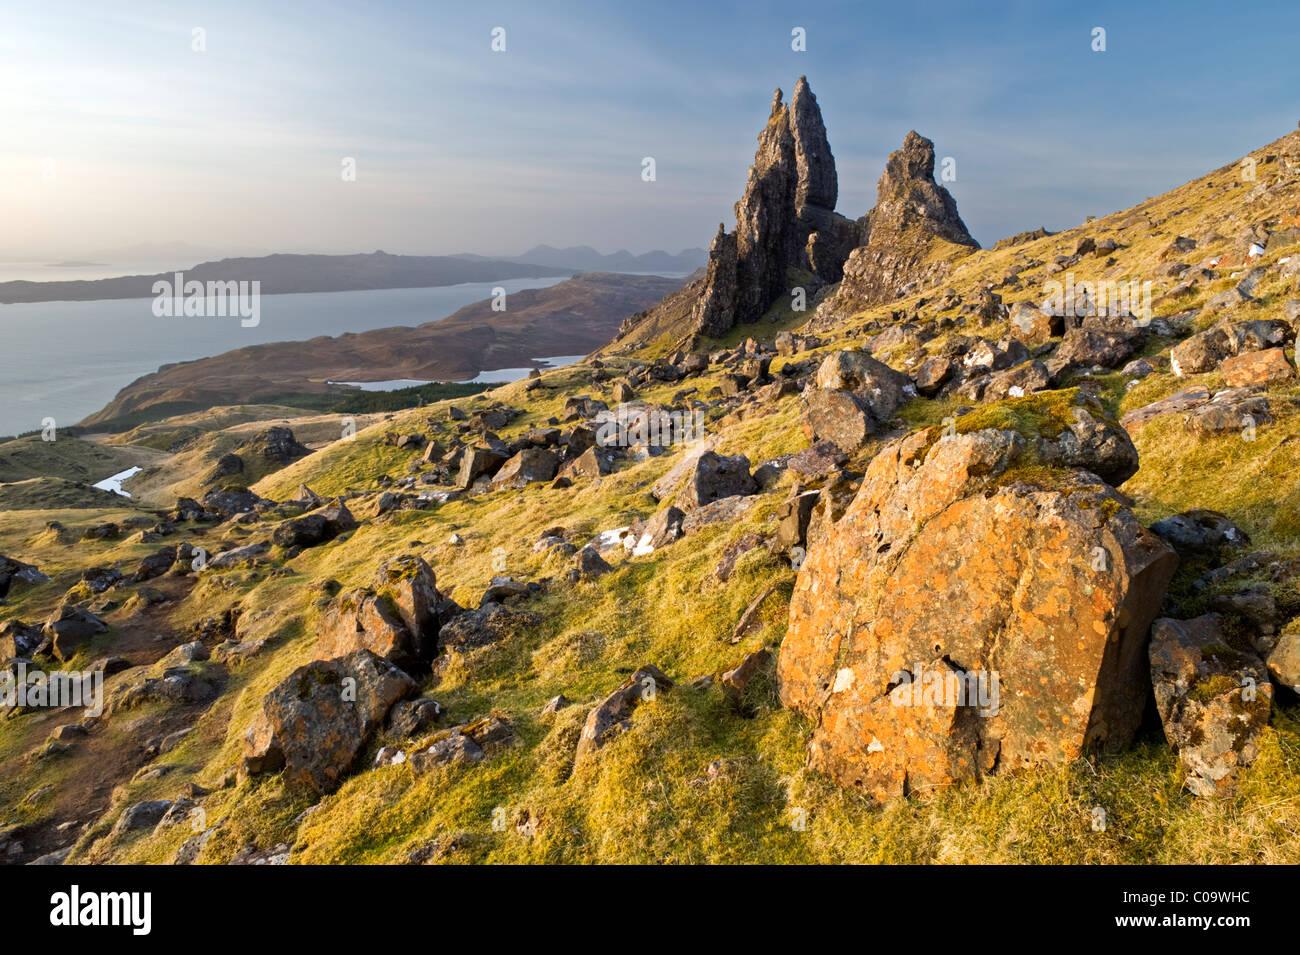 The Old Man of Storr, Trotternish Peninsular, Isle of Skye, Inner Hebrides, Scotland, UK - Stock Image